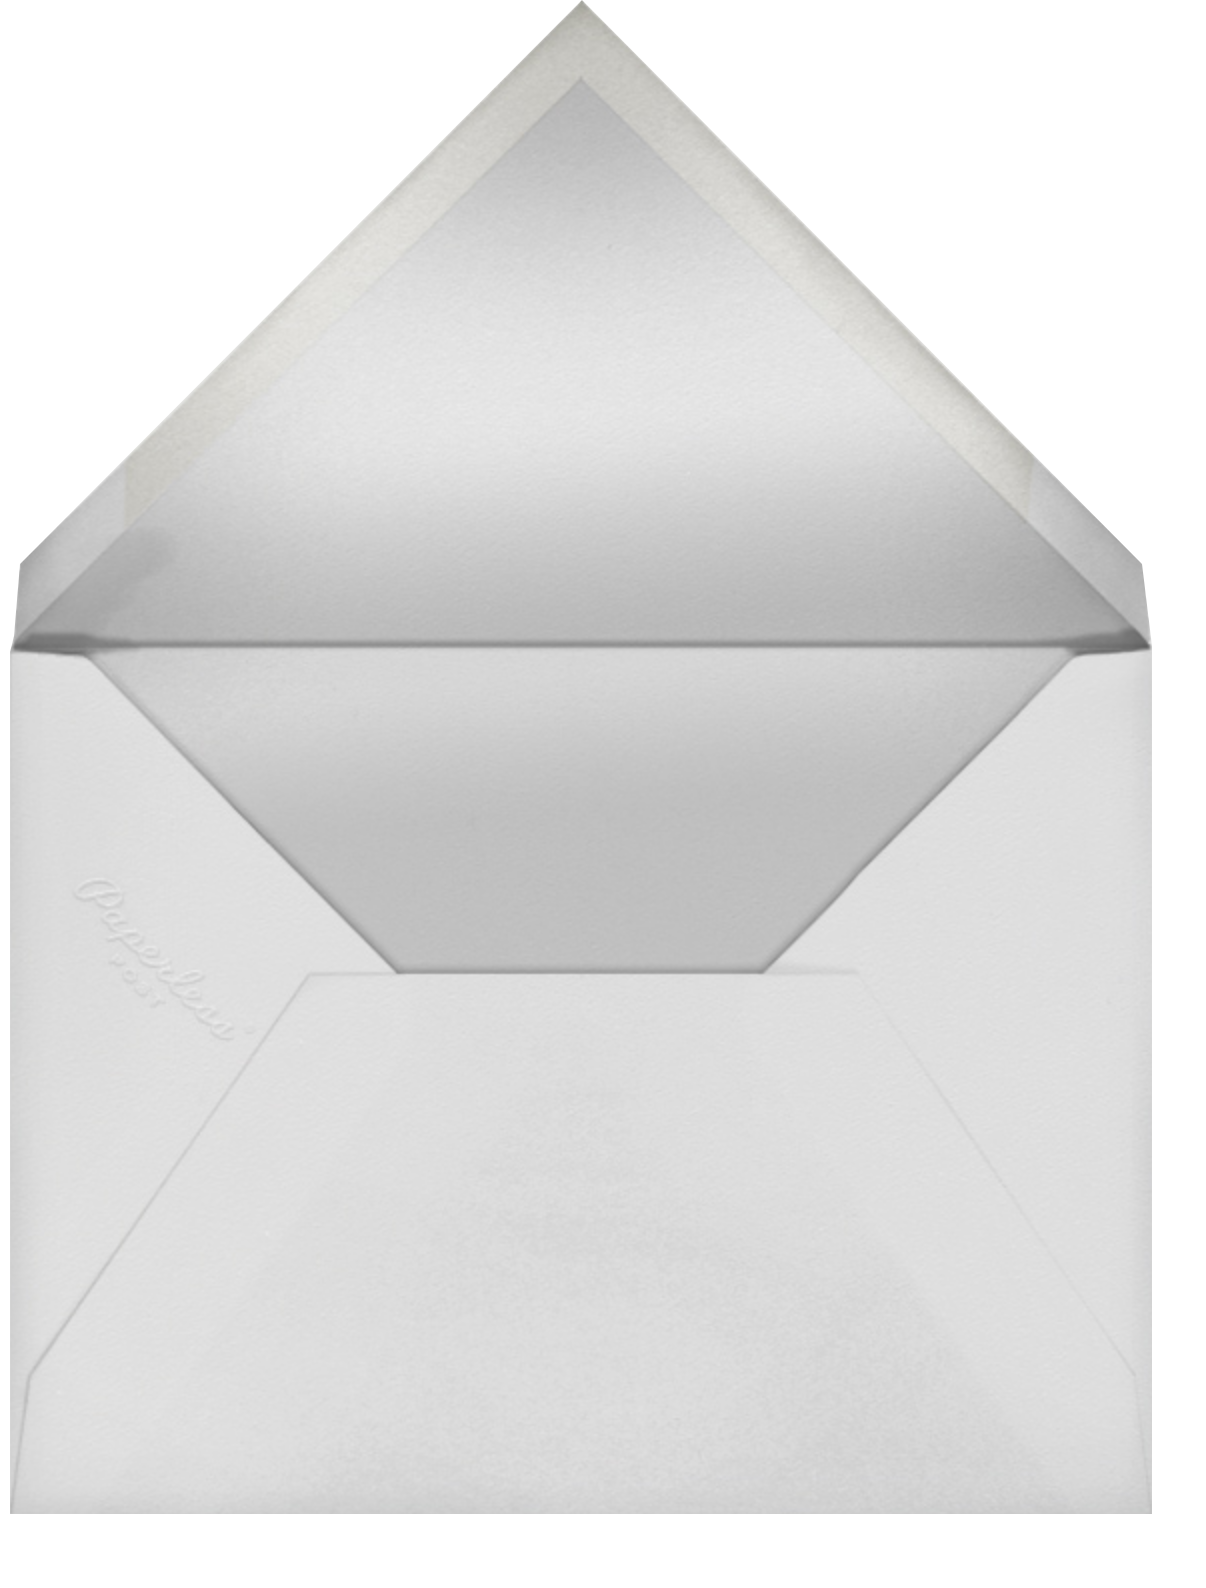 Salt and Pepper - Paperless Post - Dinner party - envelope back